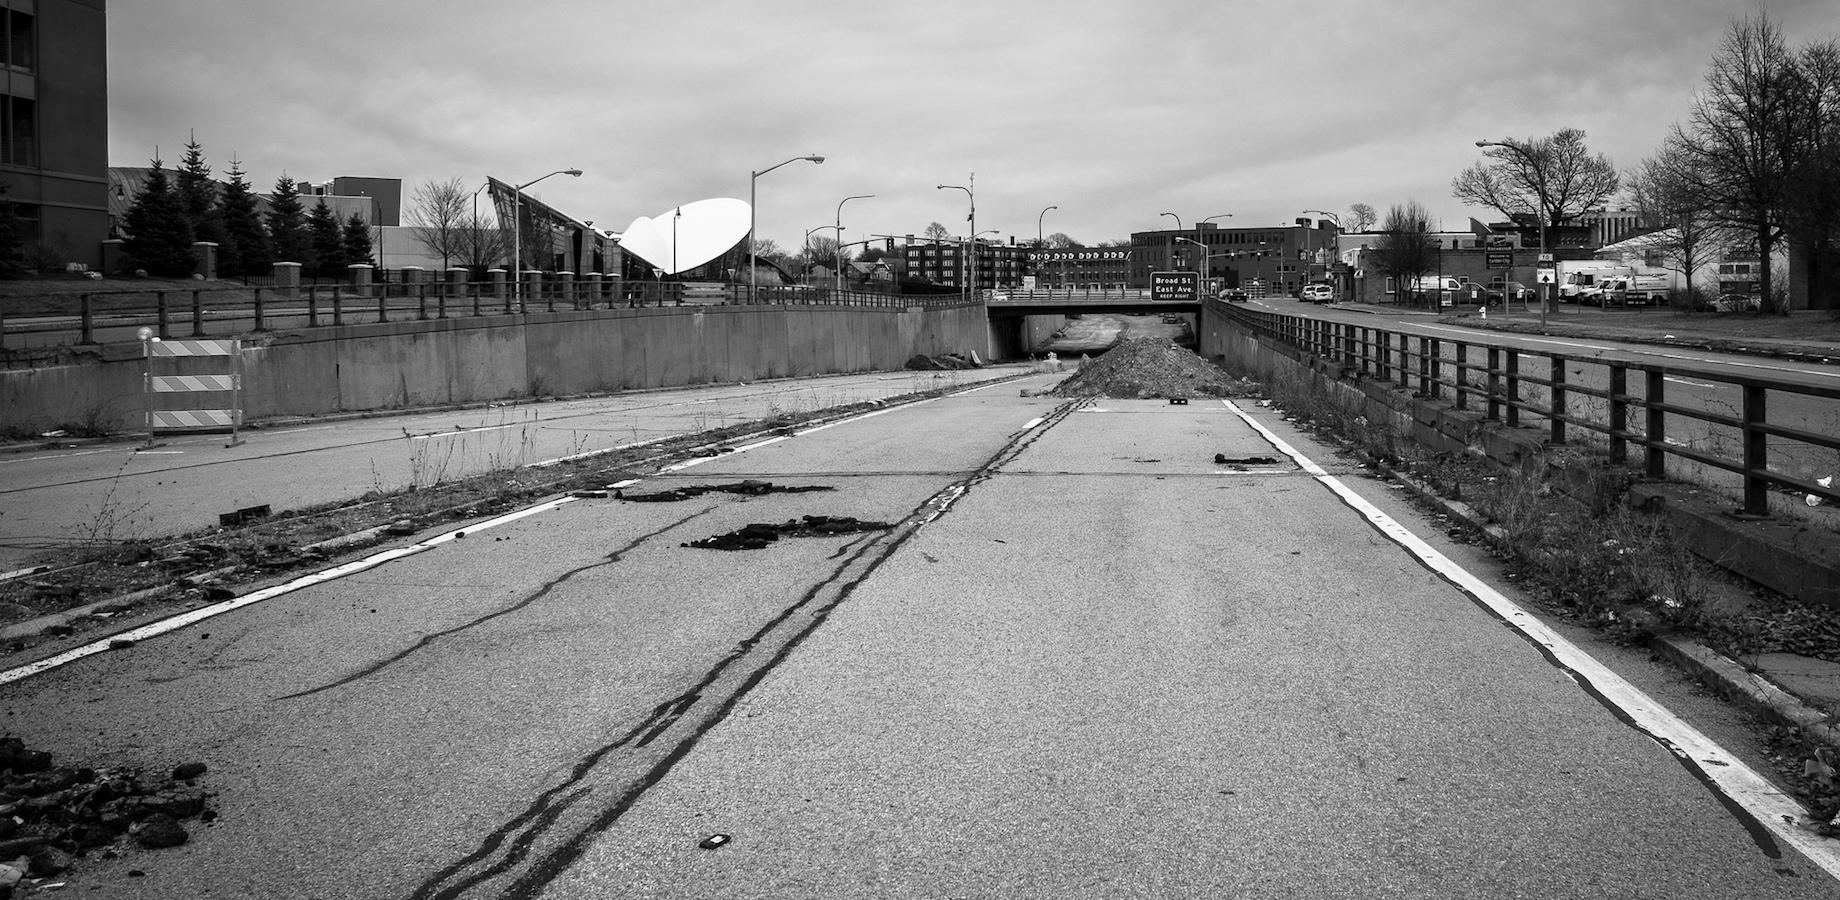 Repair of roads due to unused funds 4